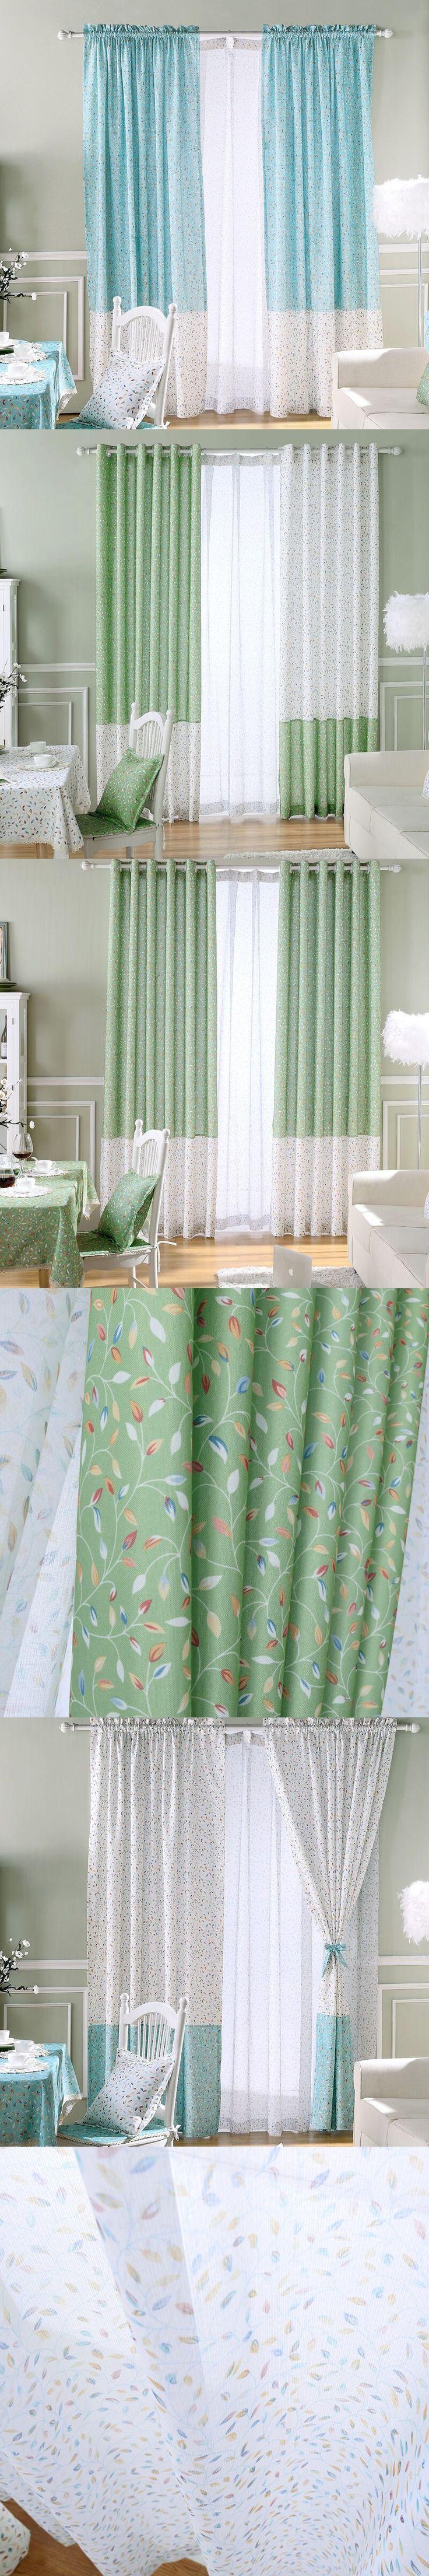 Teal Bedroom Curtains 17 Best Ideas About Teal Blinds On Pinterest Teal Bedroom Blinds